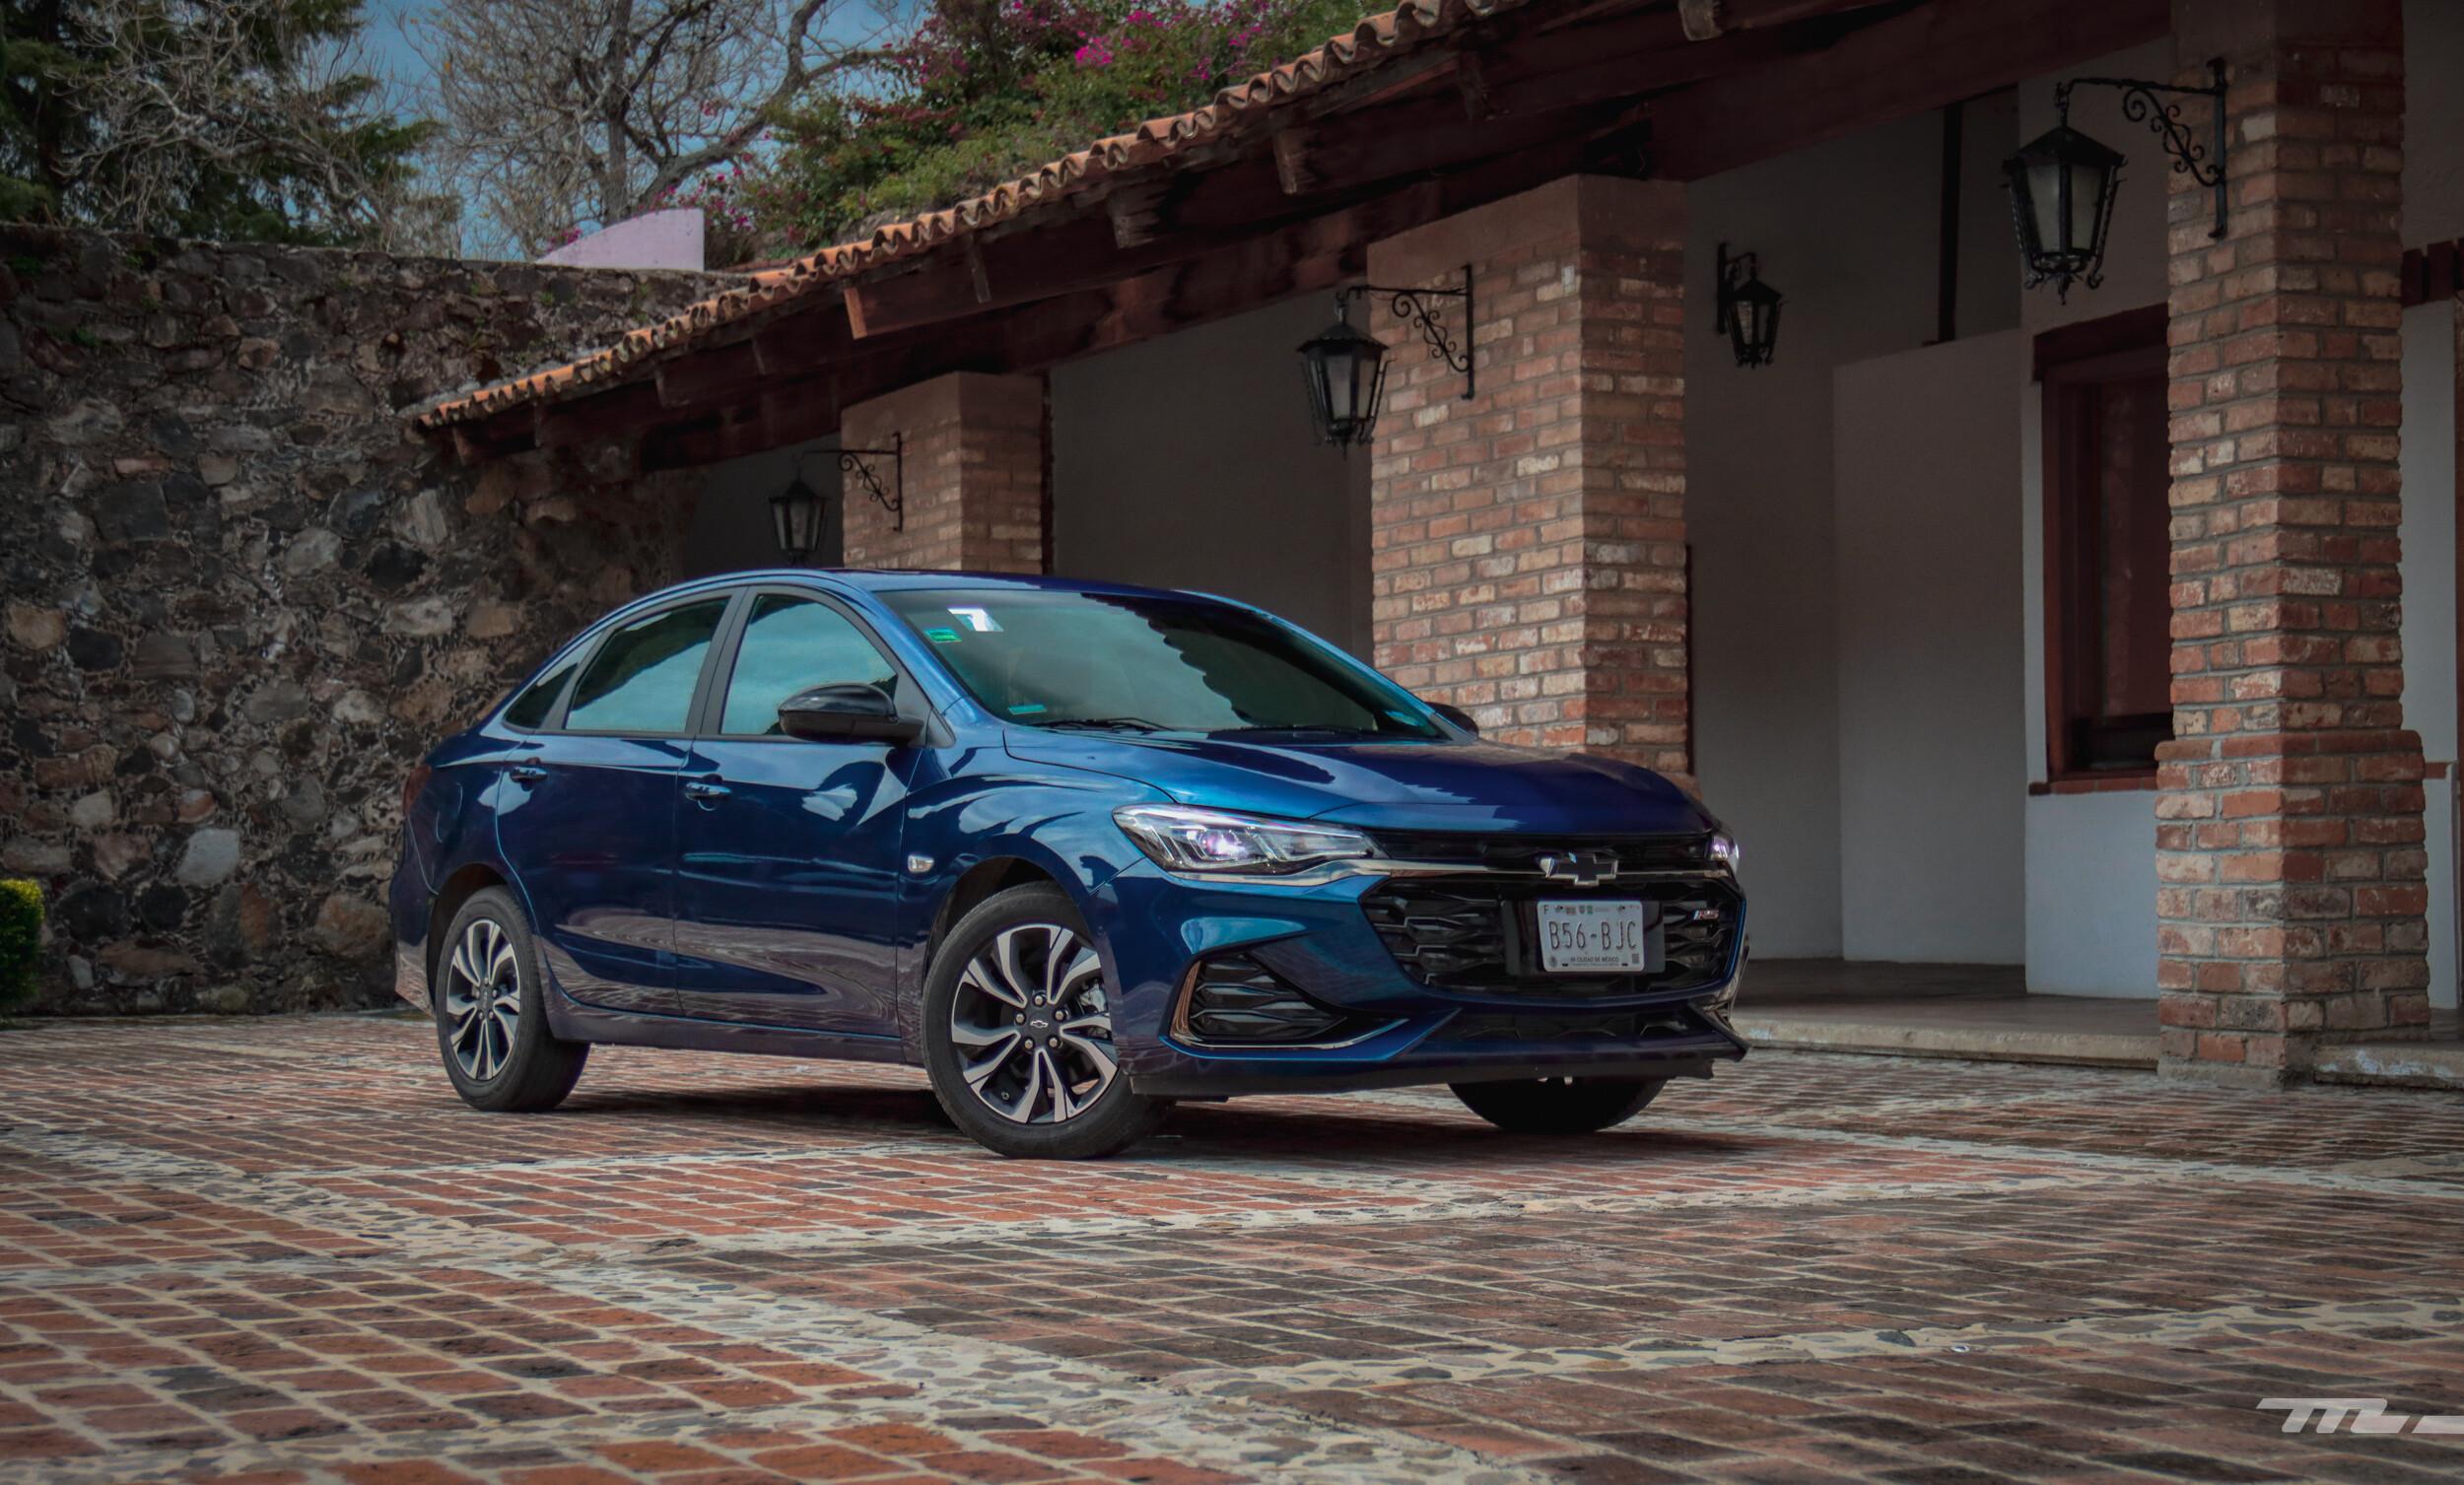 Foto de Chevrolet Cavalier Turbo 2022: Primer vistazo (18/37)